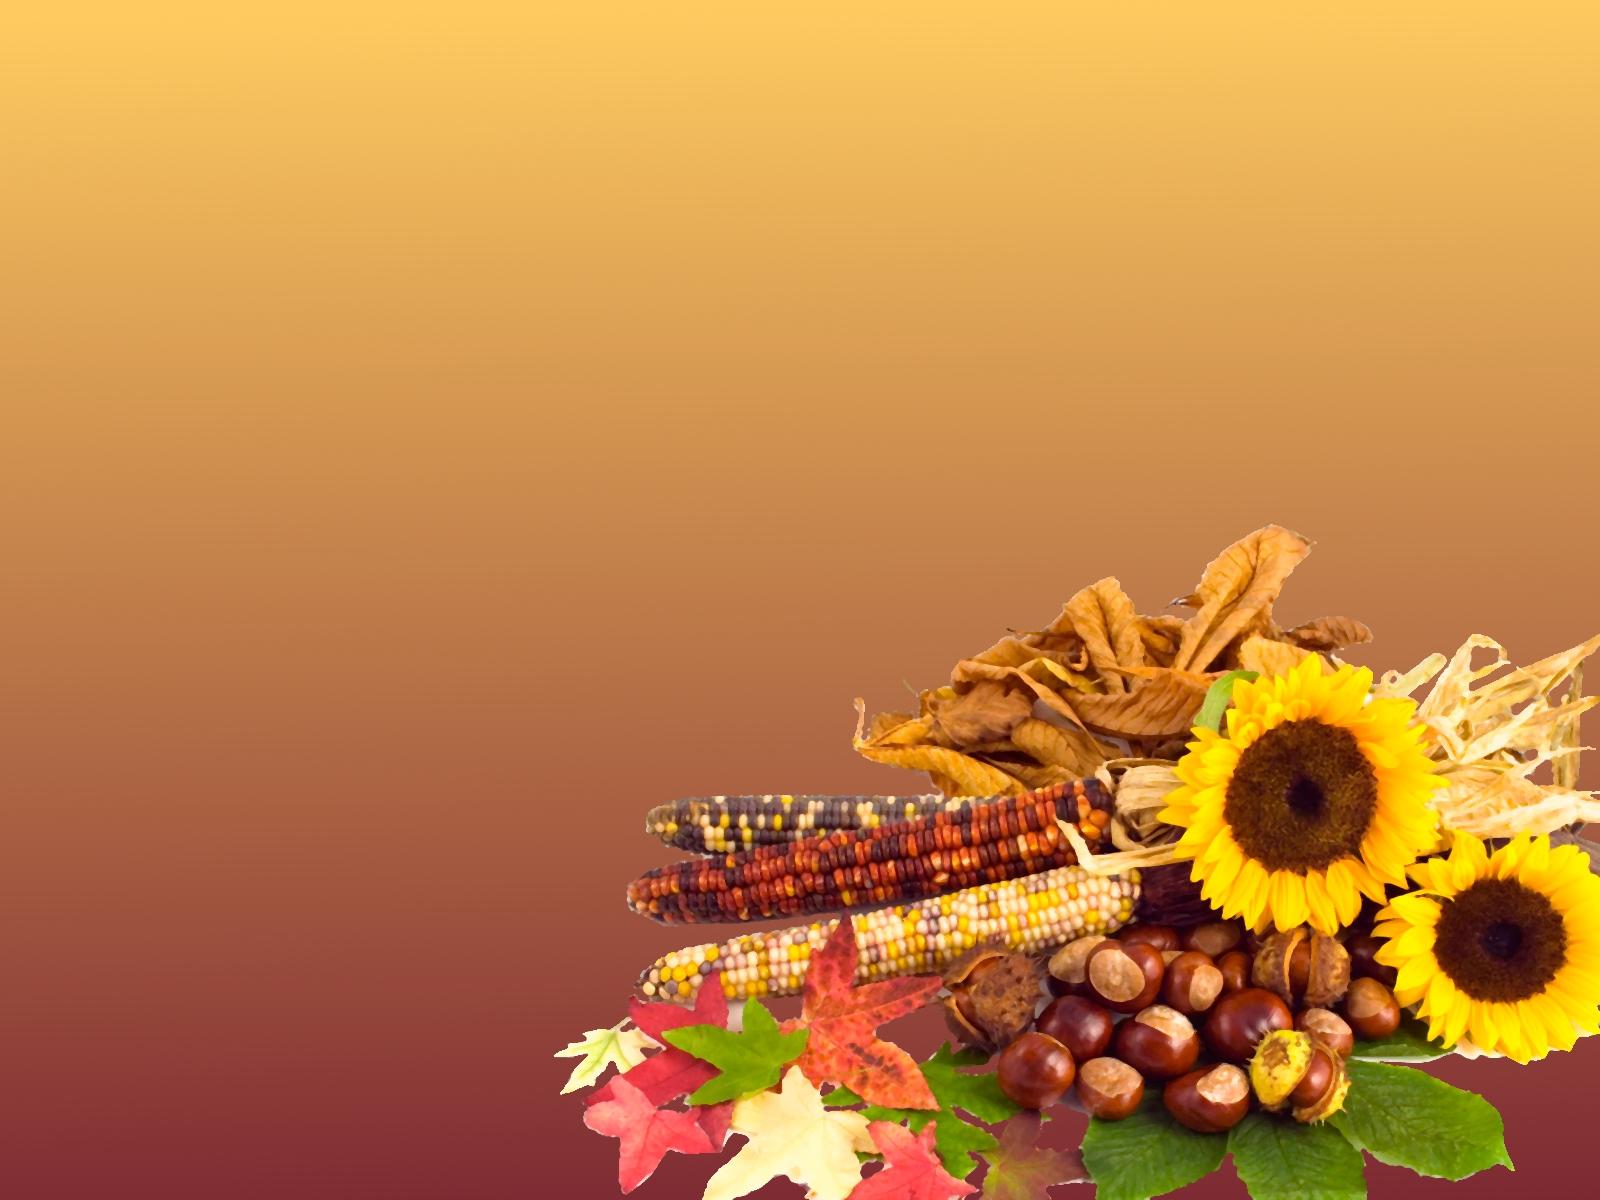 thanksgiving background - photo #10